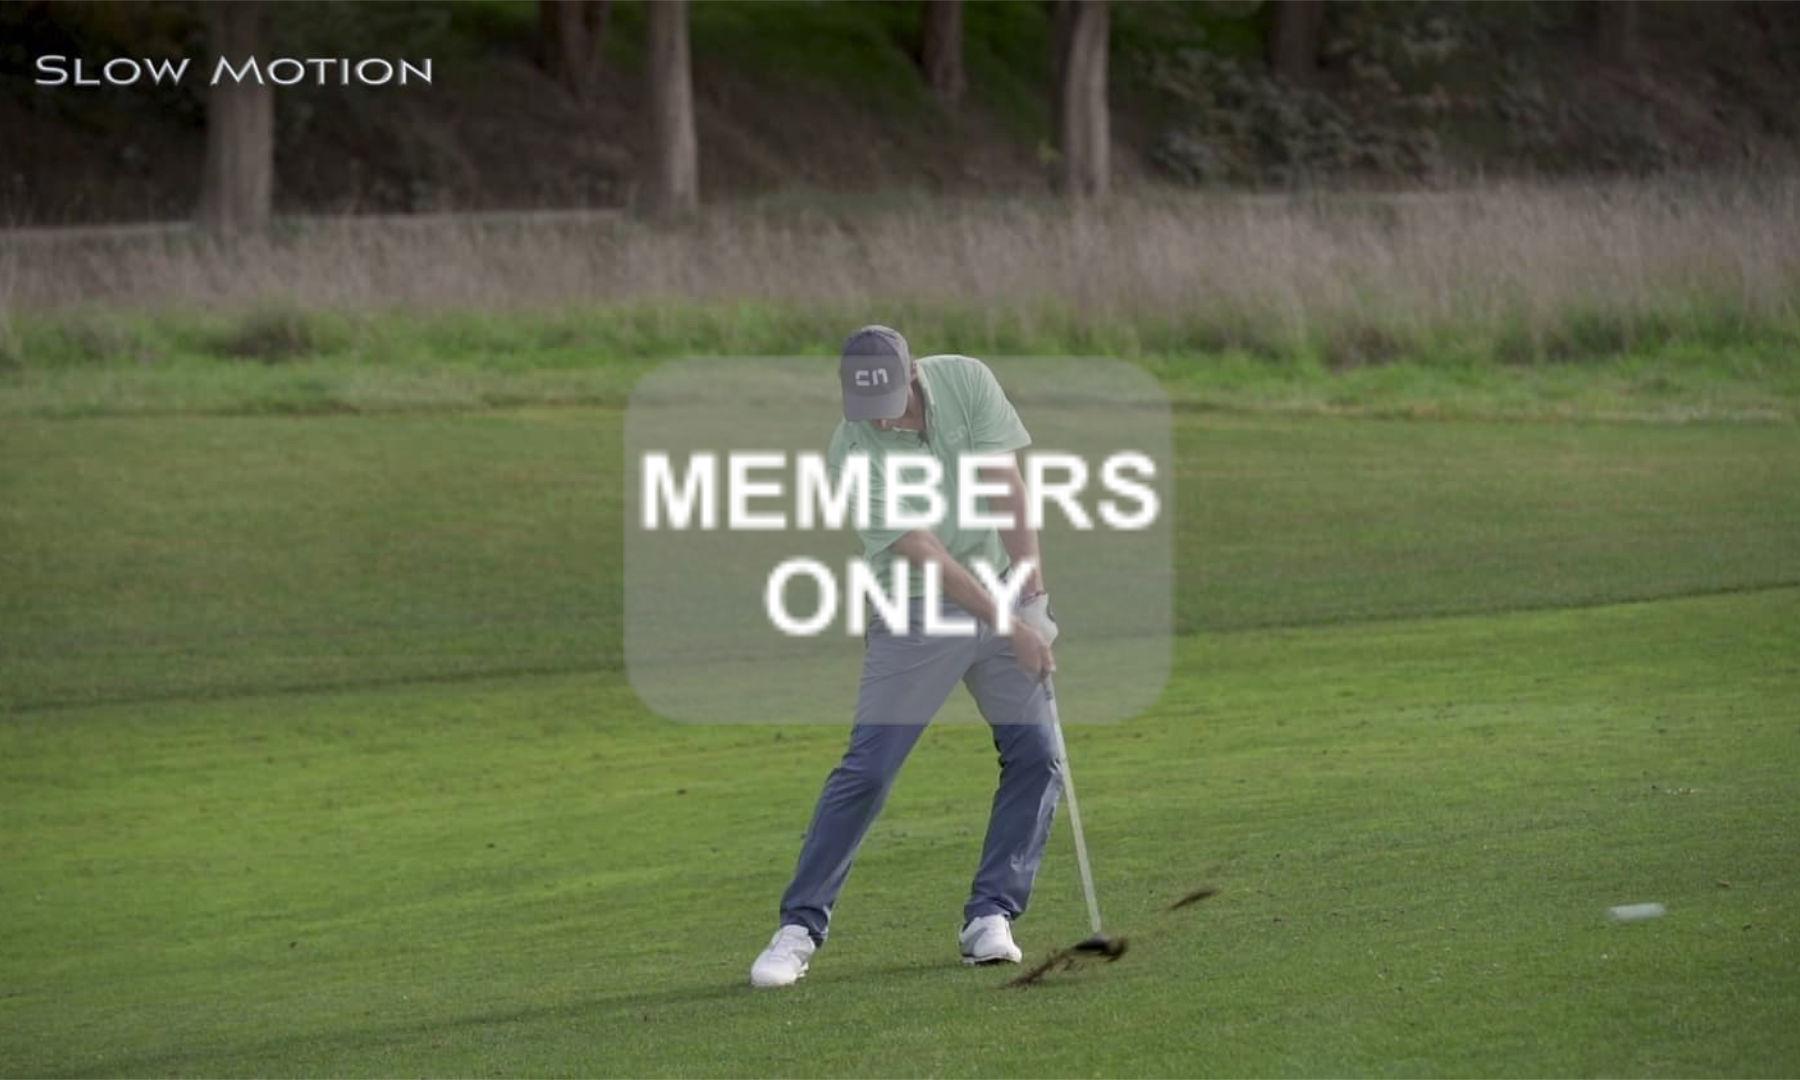 Golf lernen Videoportal - Fairwayholz - Golf spielen lernen